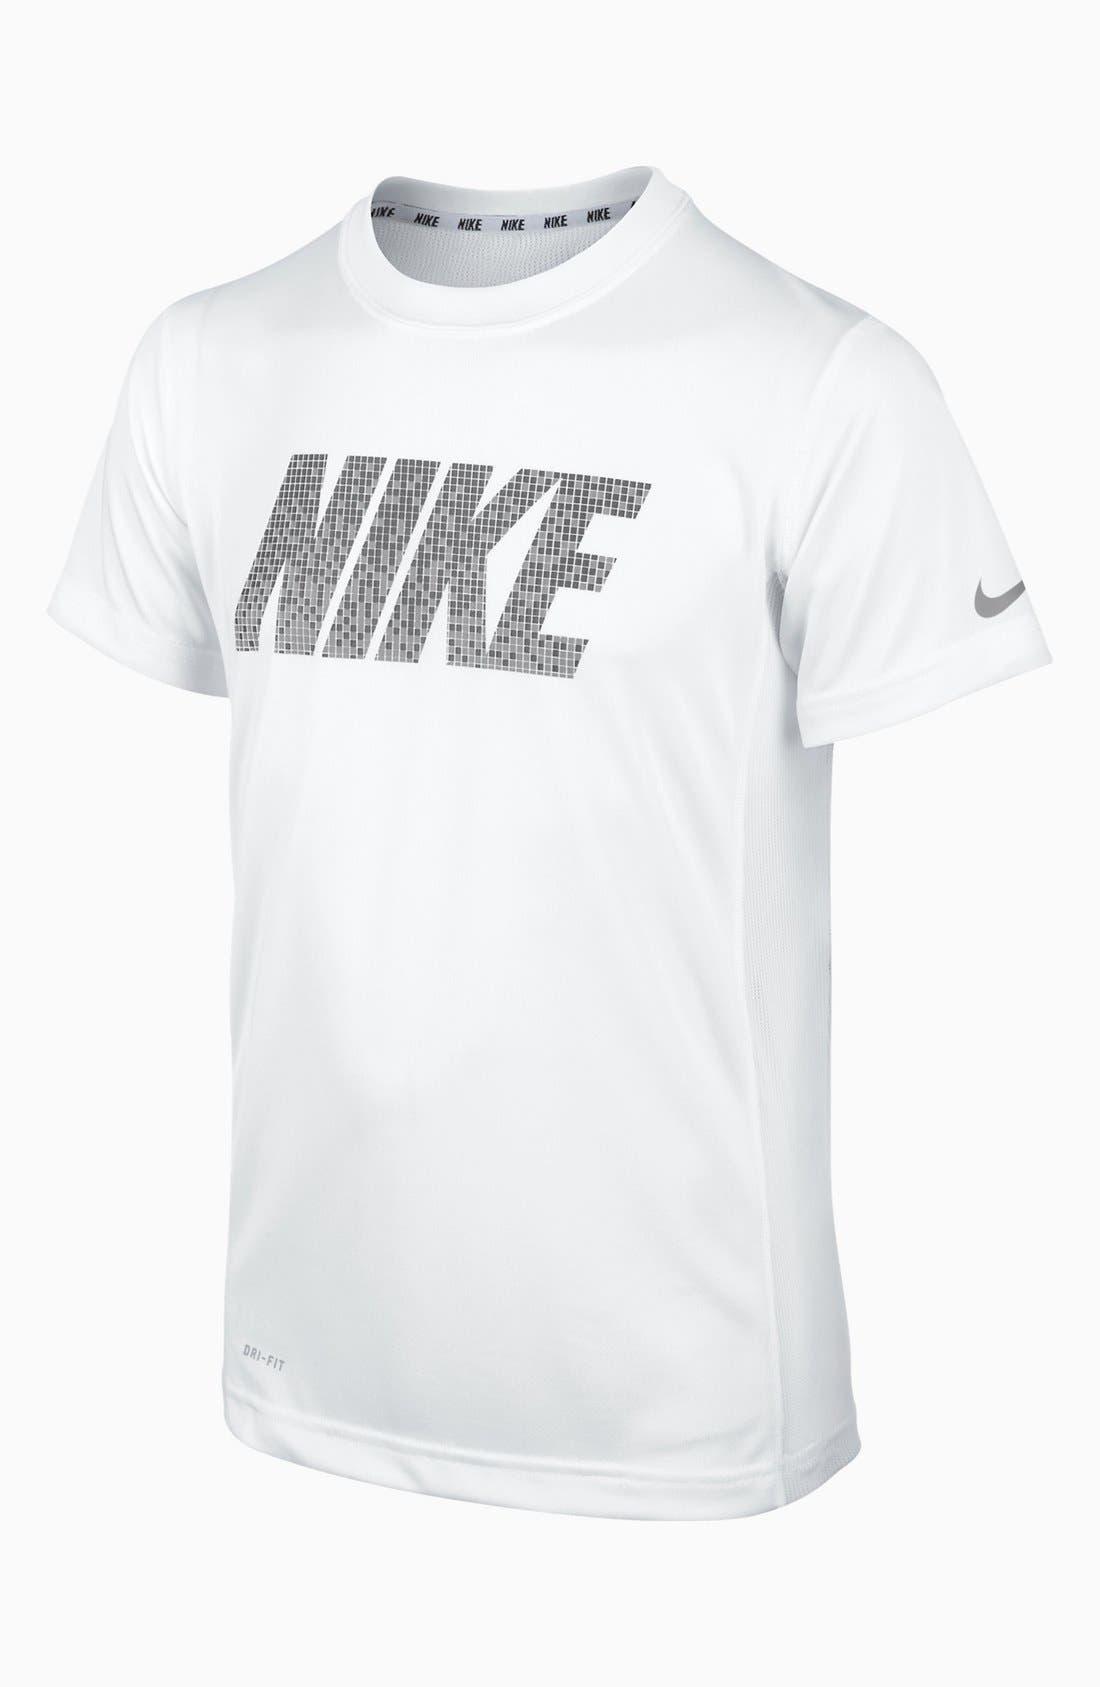 Main Image - Nike 'Speed' T-Shirt (Big Boys)